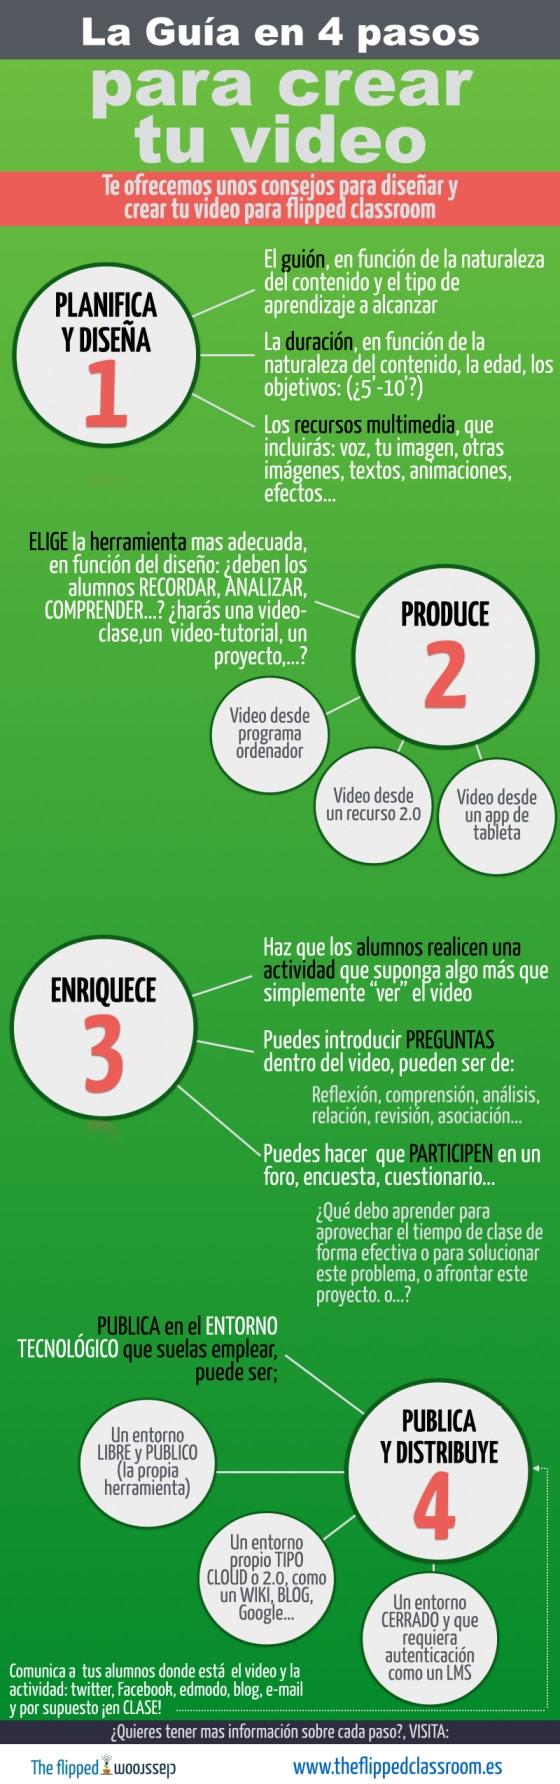 Guía para hacer un vídeo en 4 pasos para flipped classroom